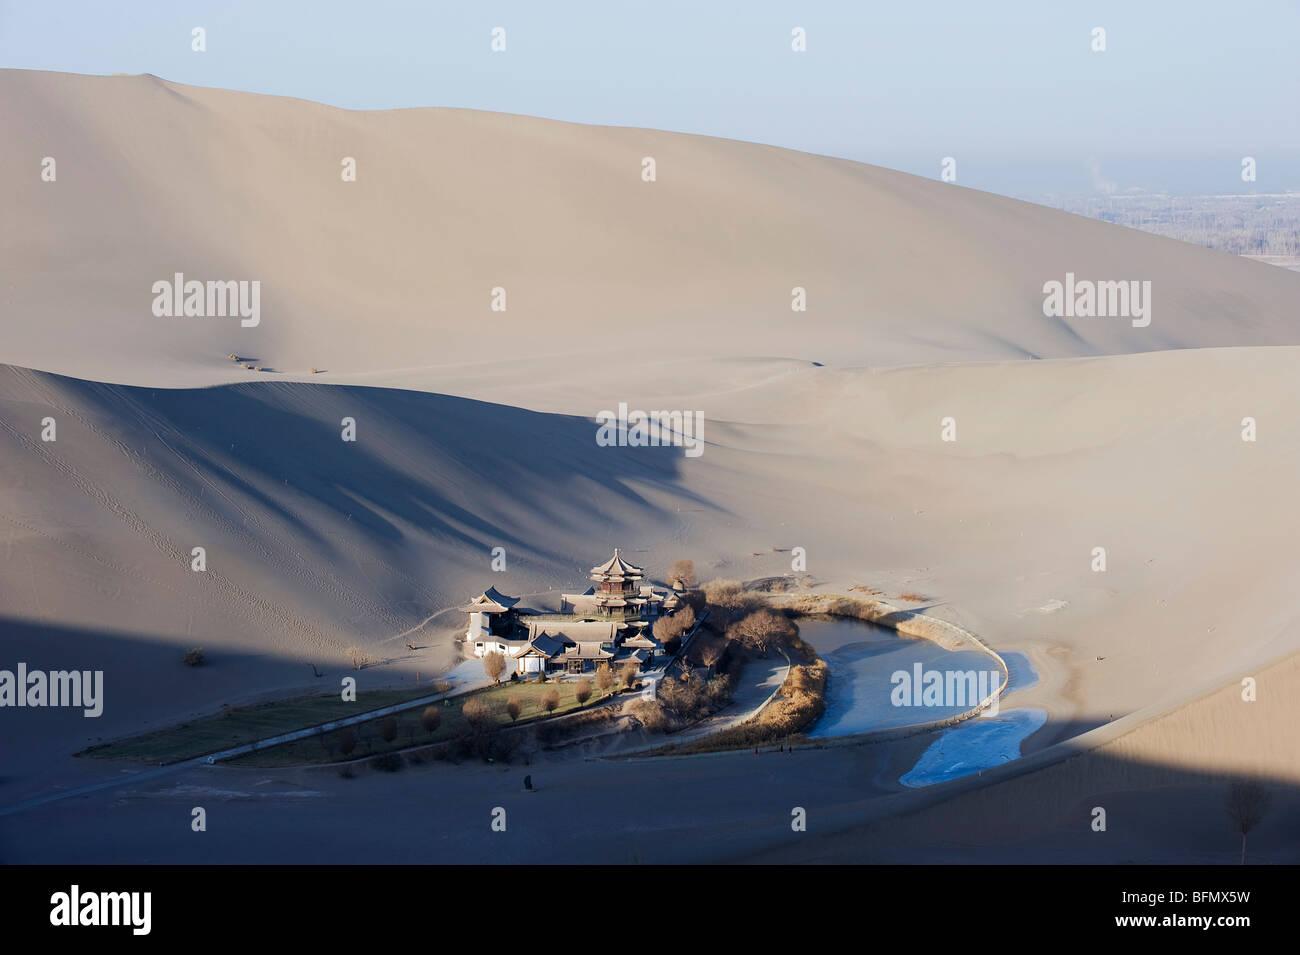 China, Gansu Province, Dunghuang, Ming Sha sand dunes and pavilion at Crescent Moon Lake - Stock Image